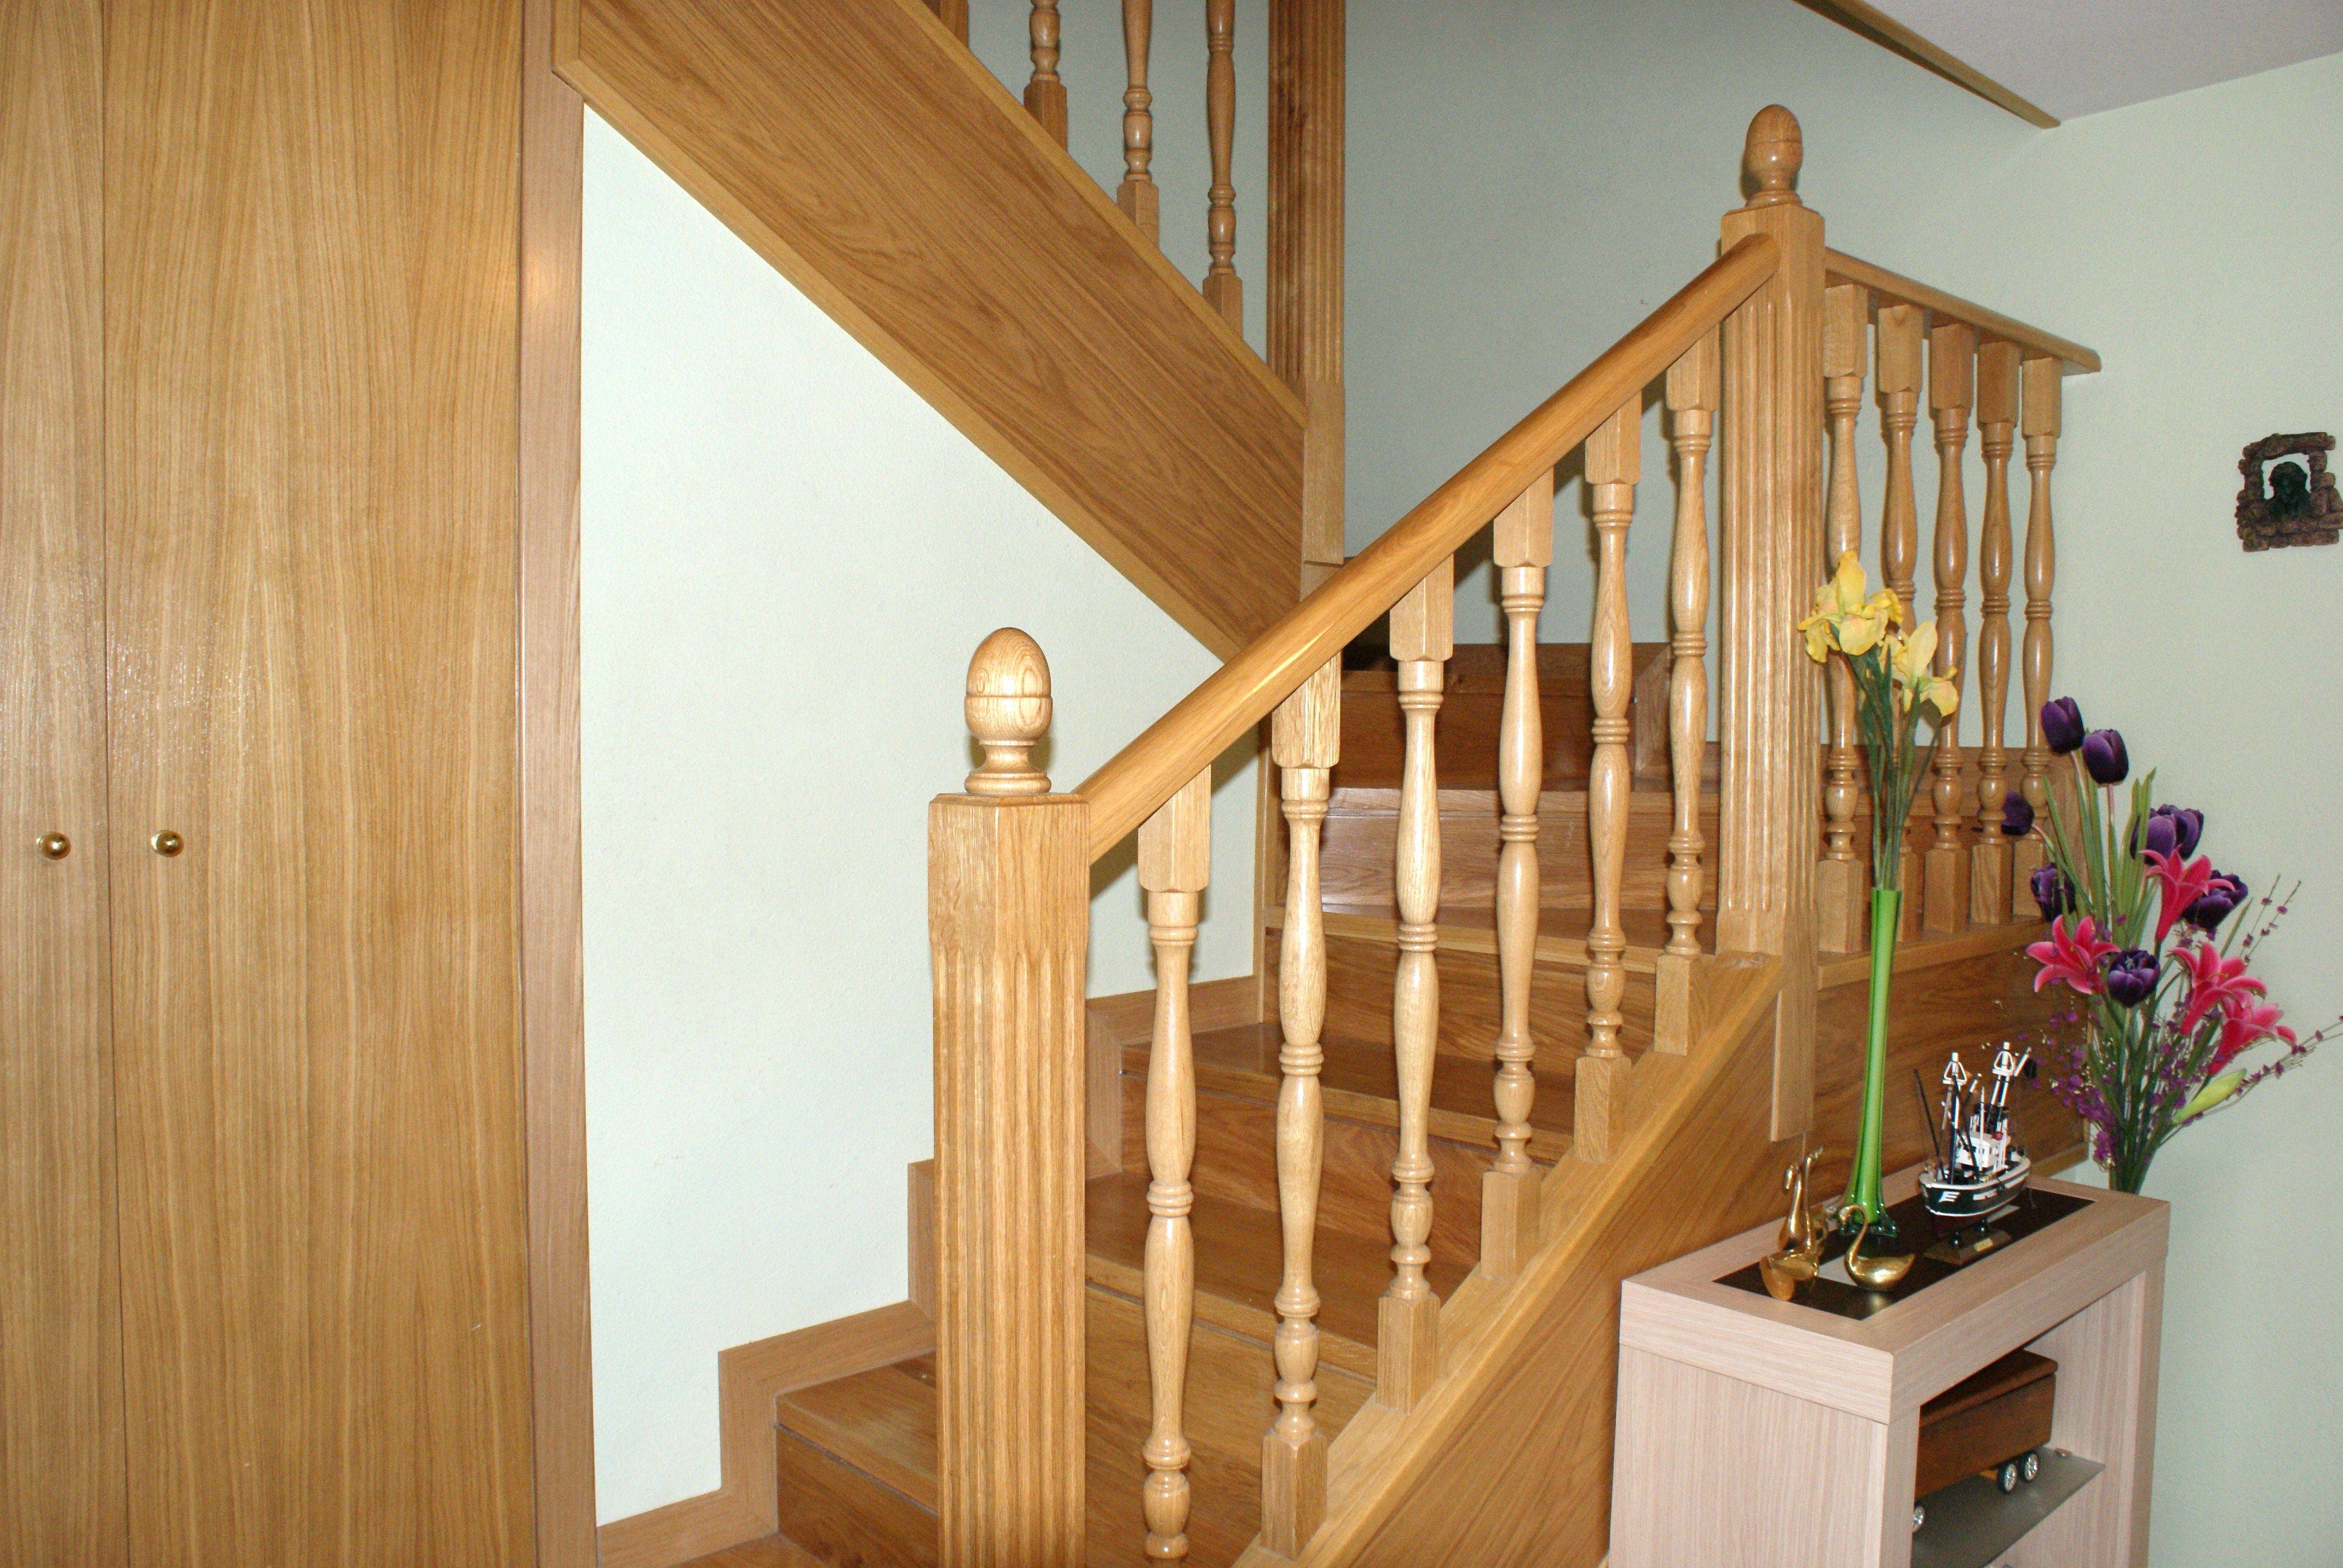 Escaleras de madera a medida cat logo de carpinter a for Carpinteria en madera